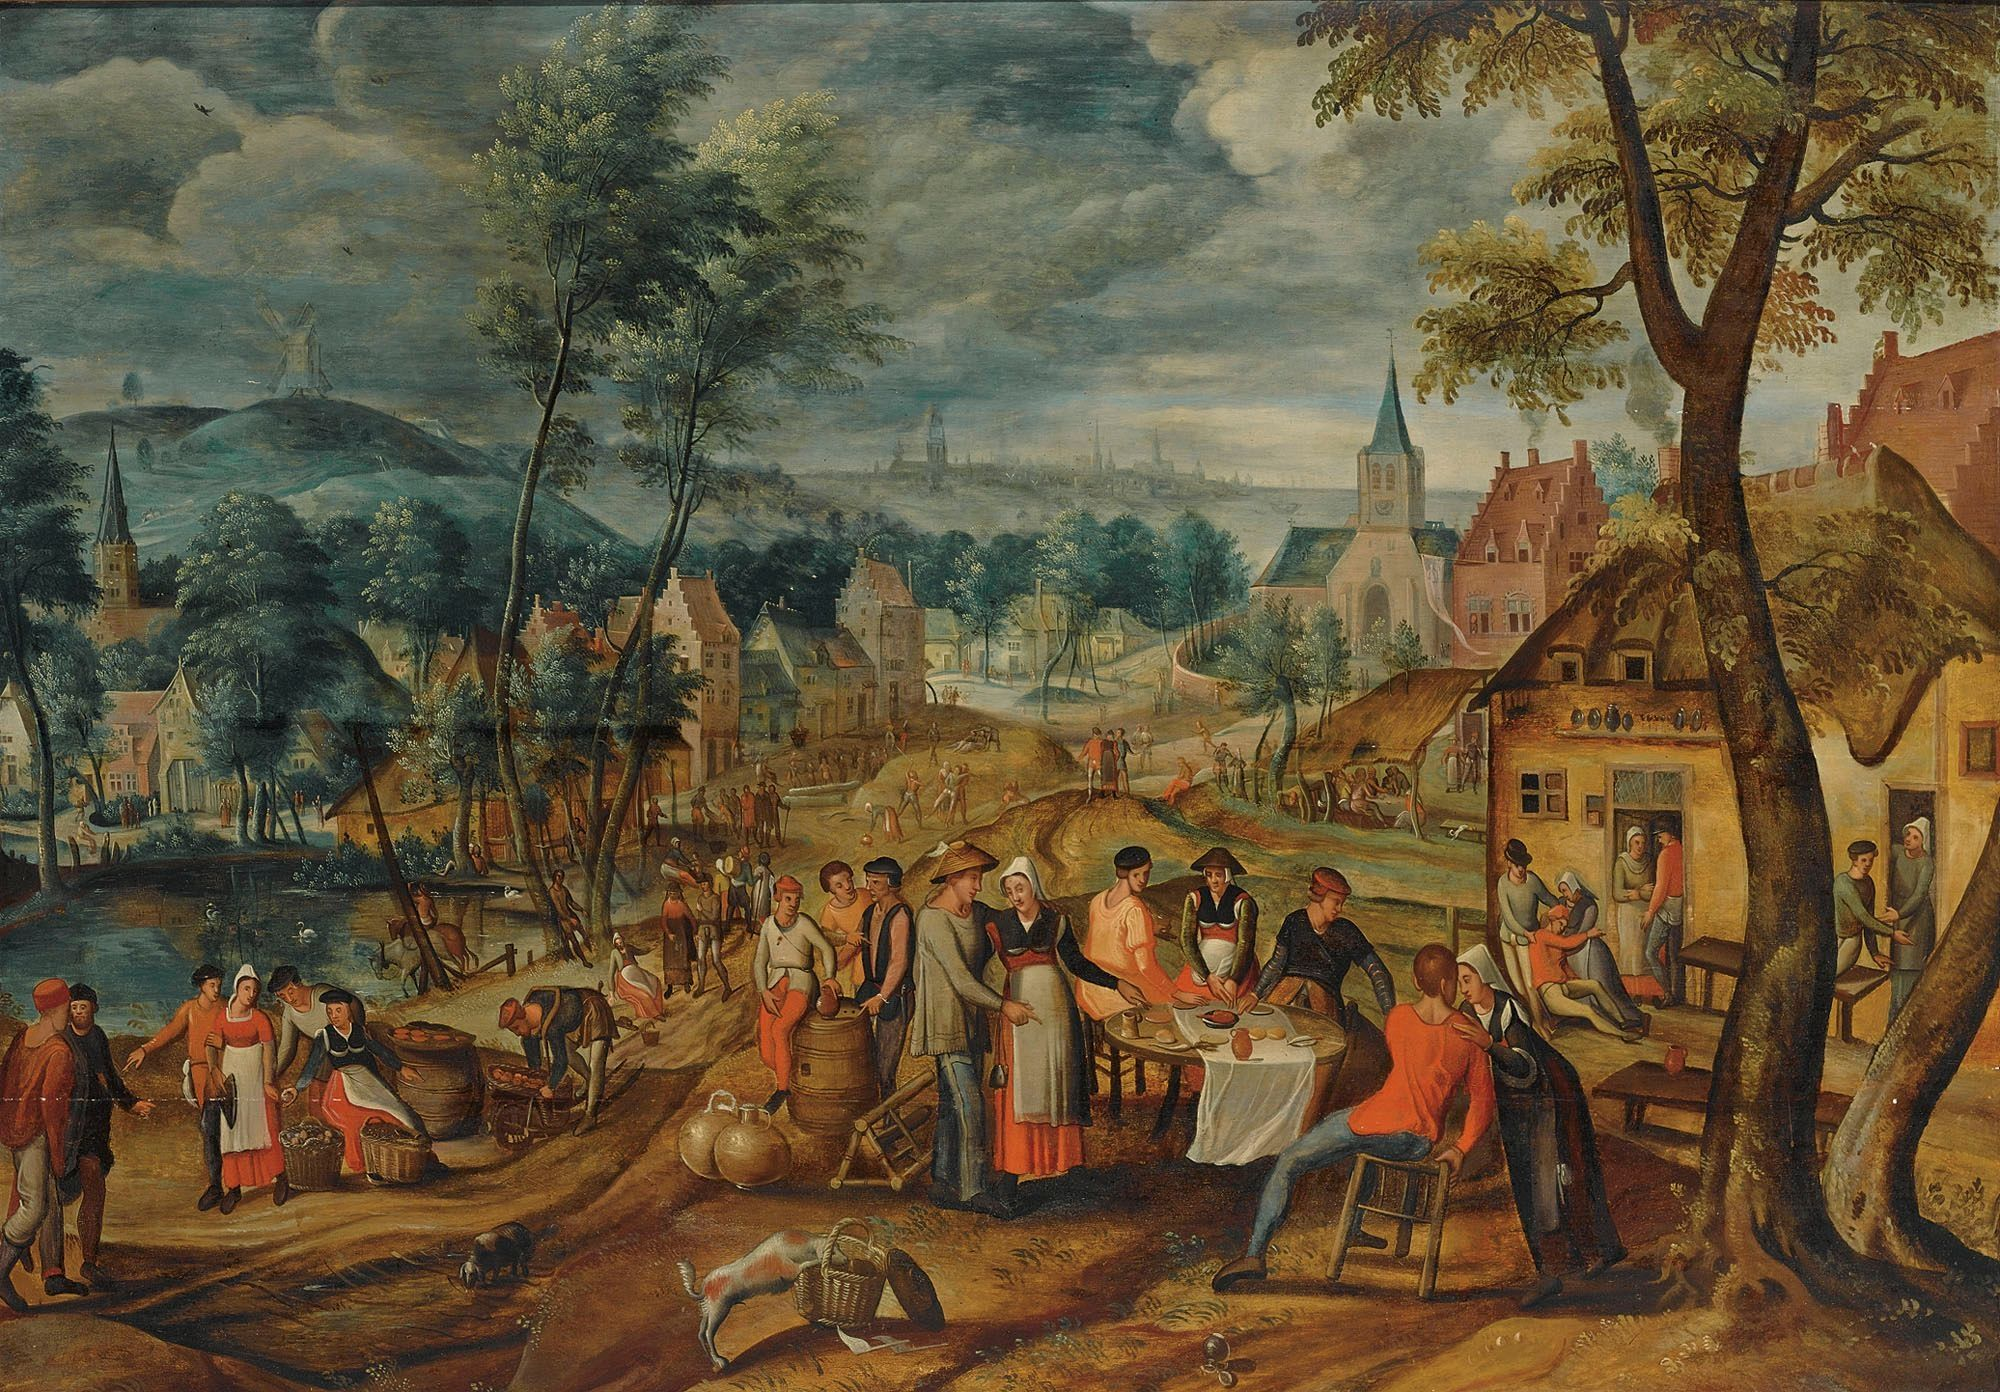 Landschaftsmalerei renaissance  ギリス・モスタアート (Gillis Mostaert)「A village scene with ...